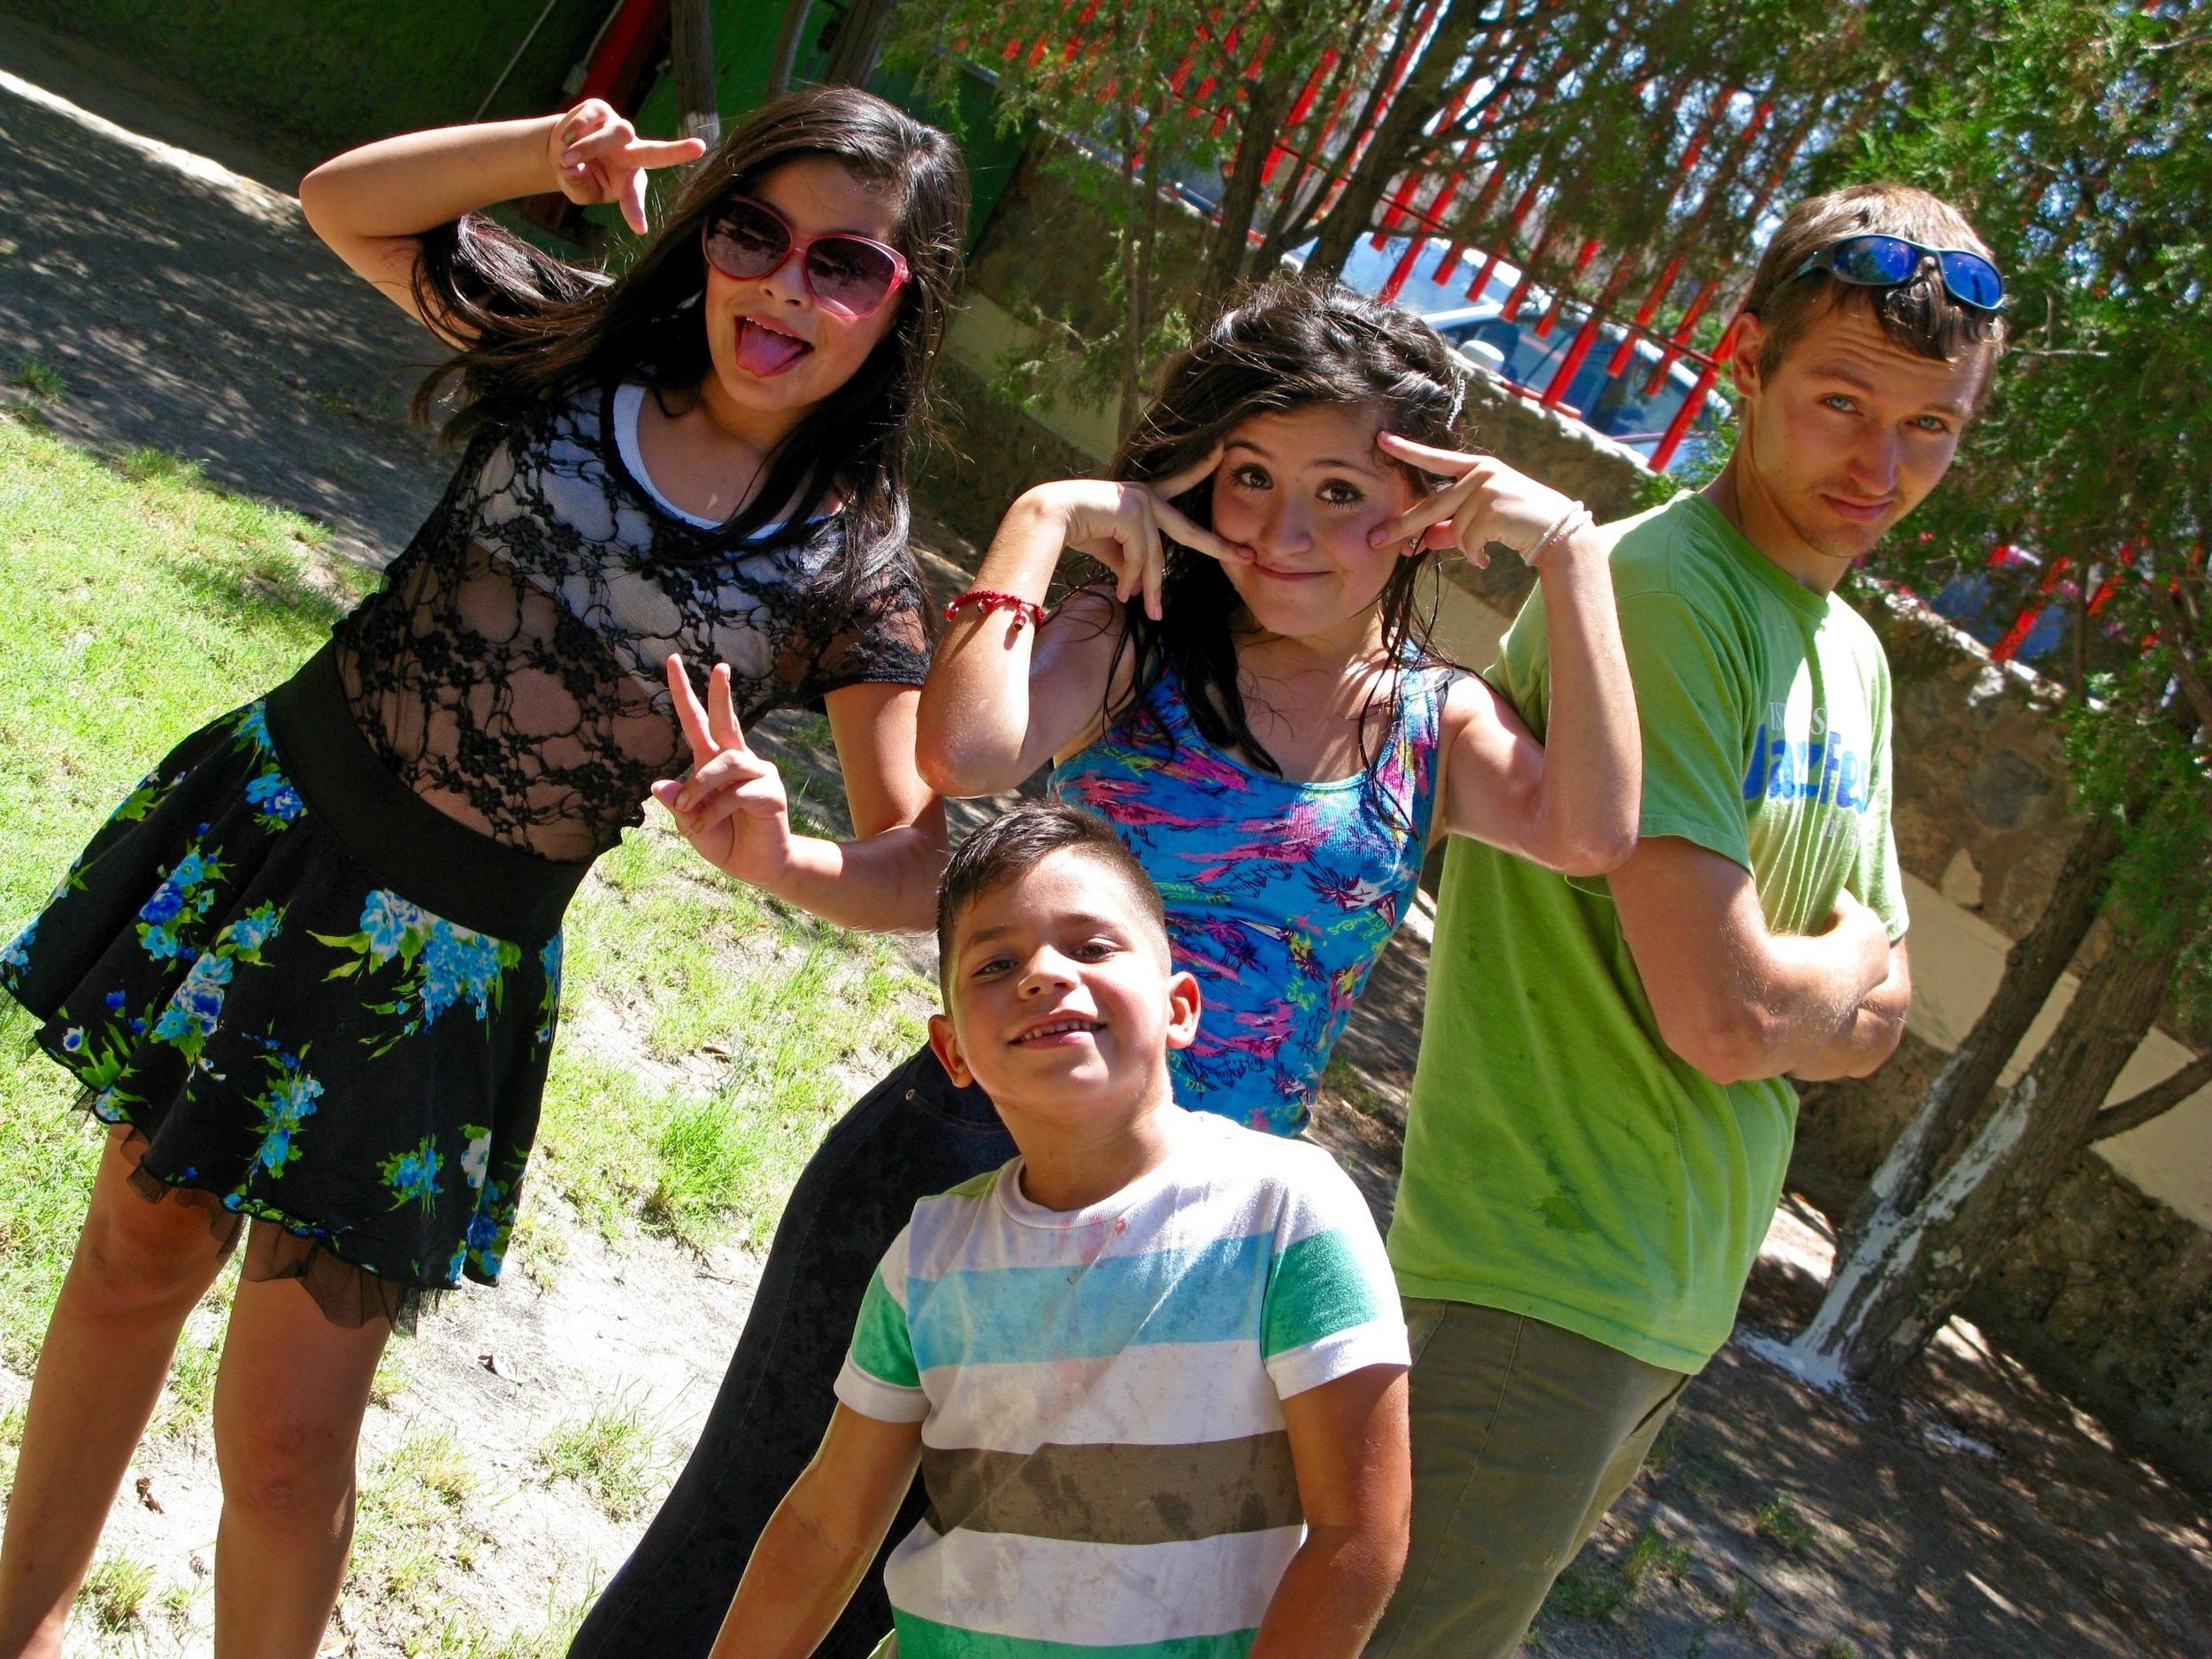 Cool kids.